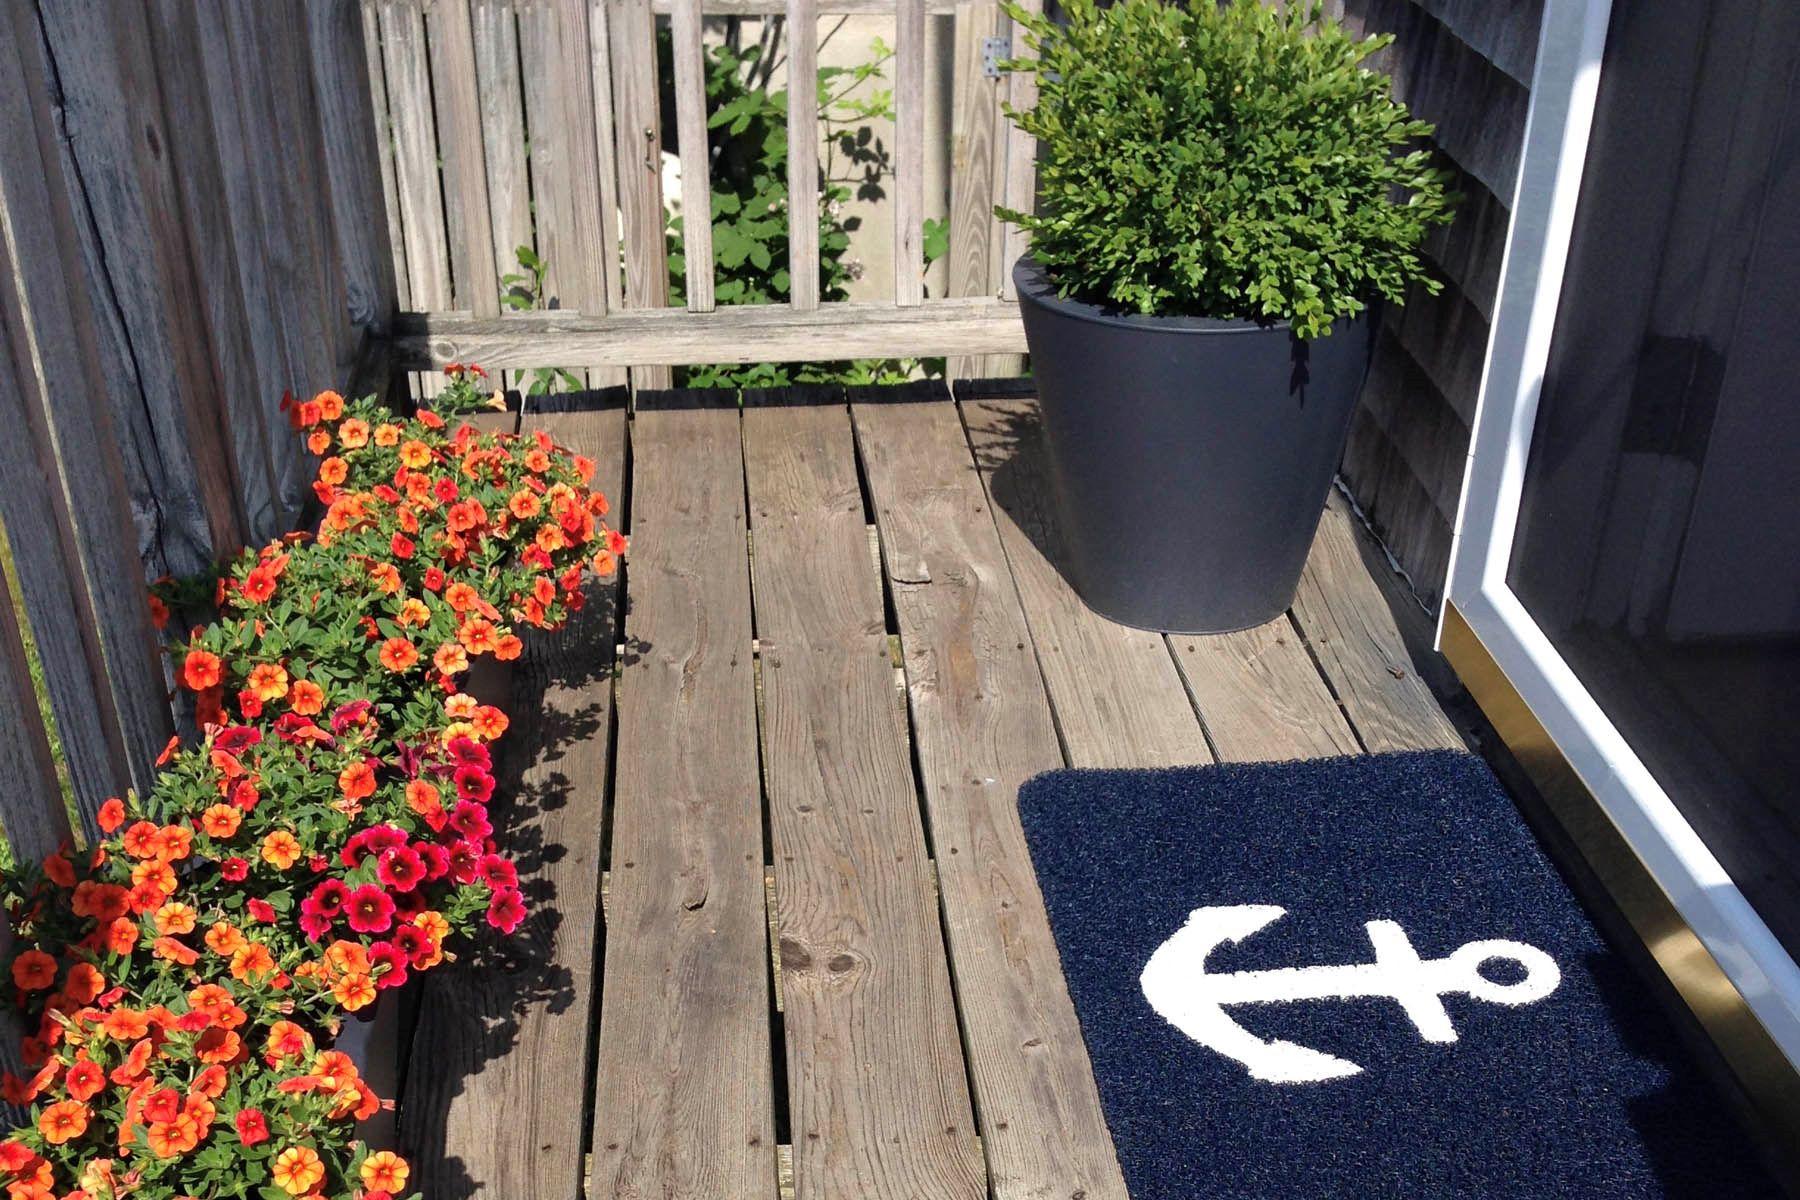 Kat Mülkiyeti için Satış at A Place to Call Home 133 Old South Road Unit A Nantucket, Massachusetts, 02554 Amerika Birleşik Devletleri